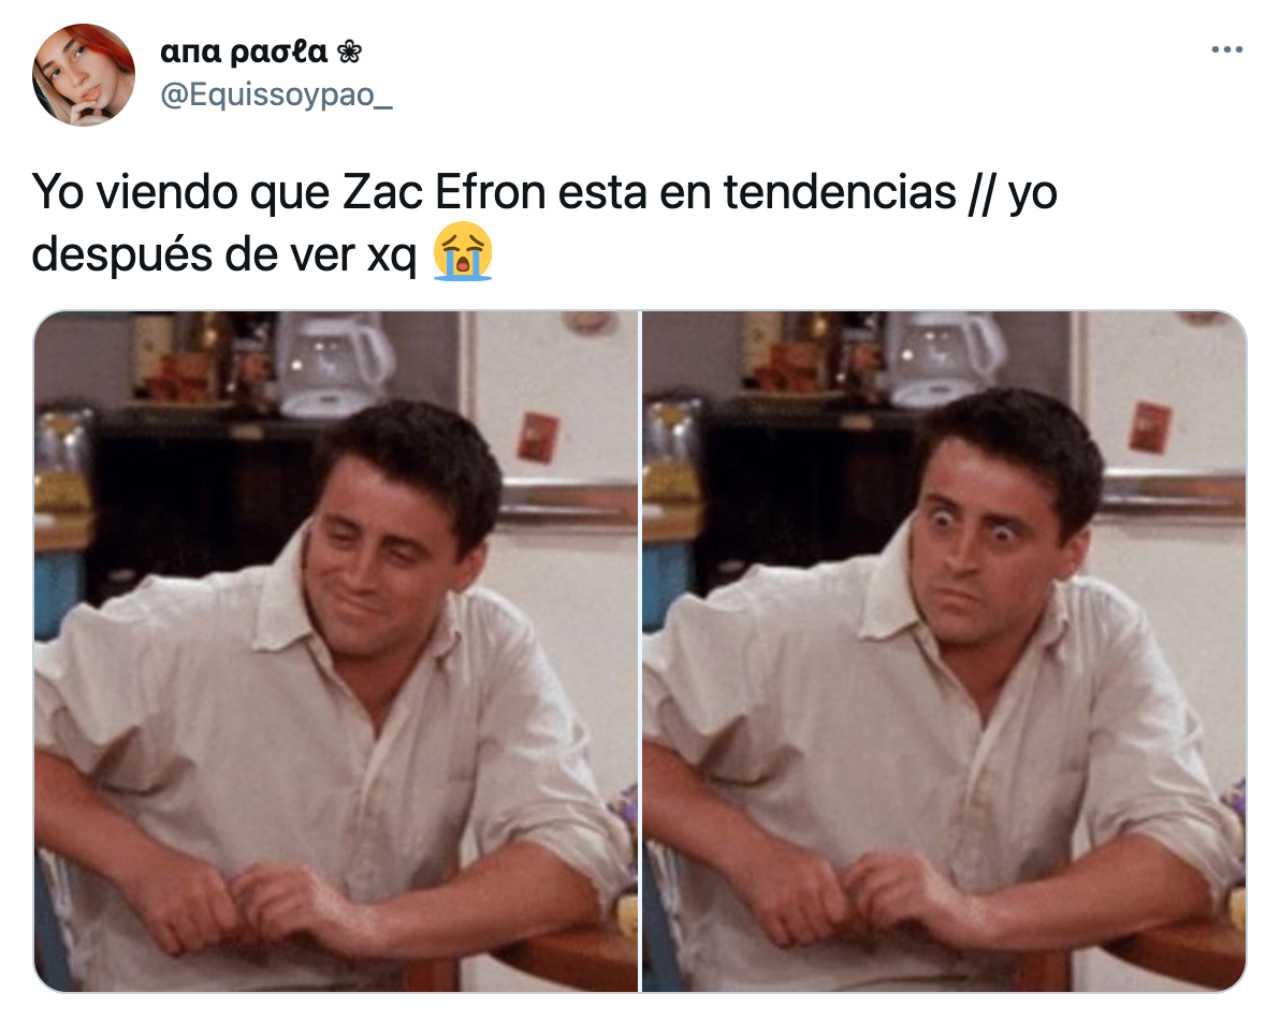 Meme de Zac Efron con reacción de Friends